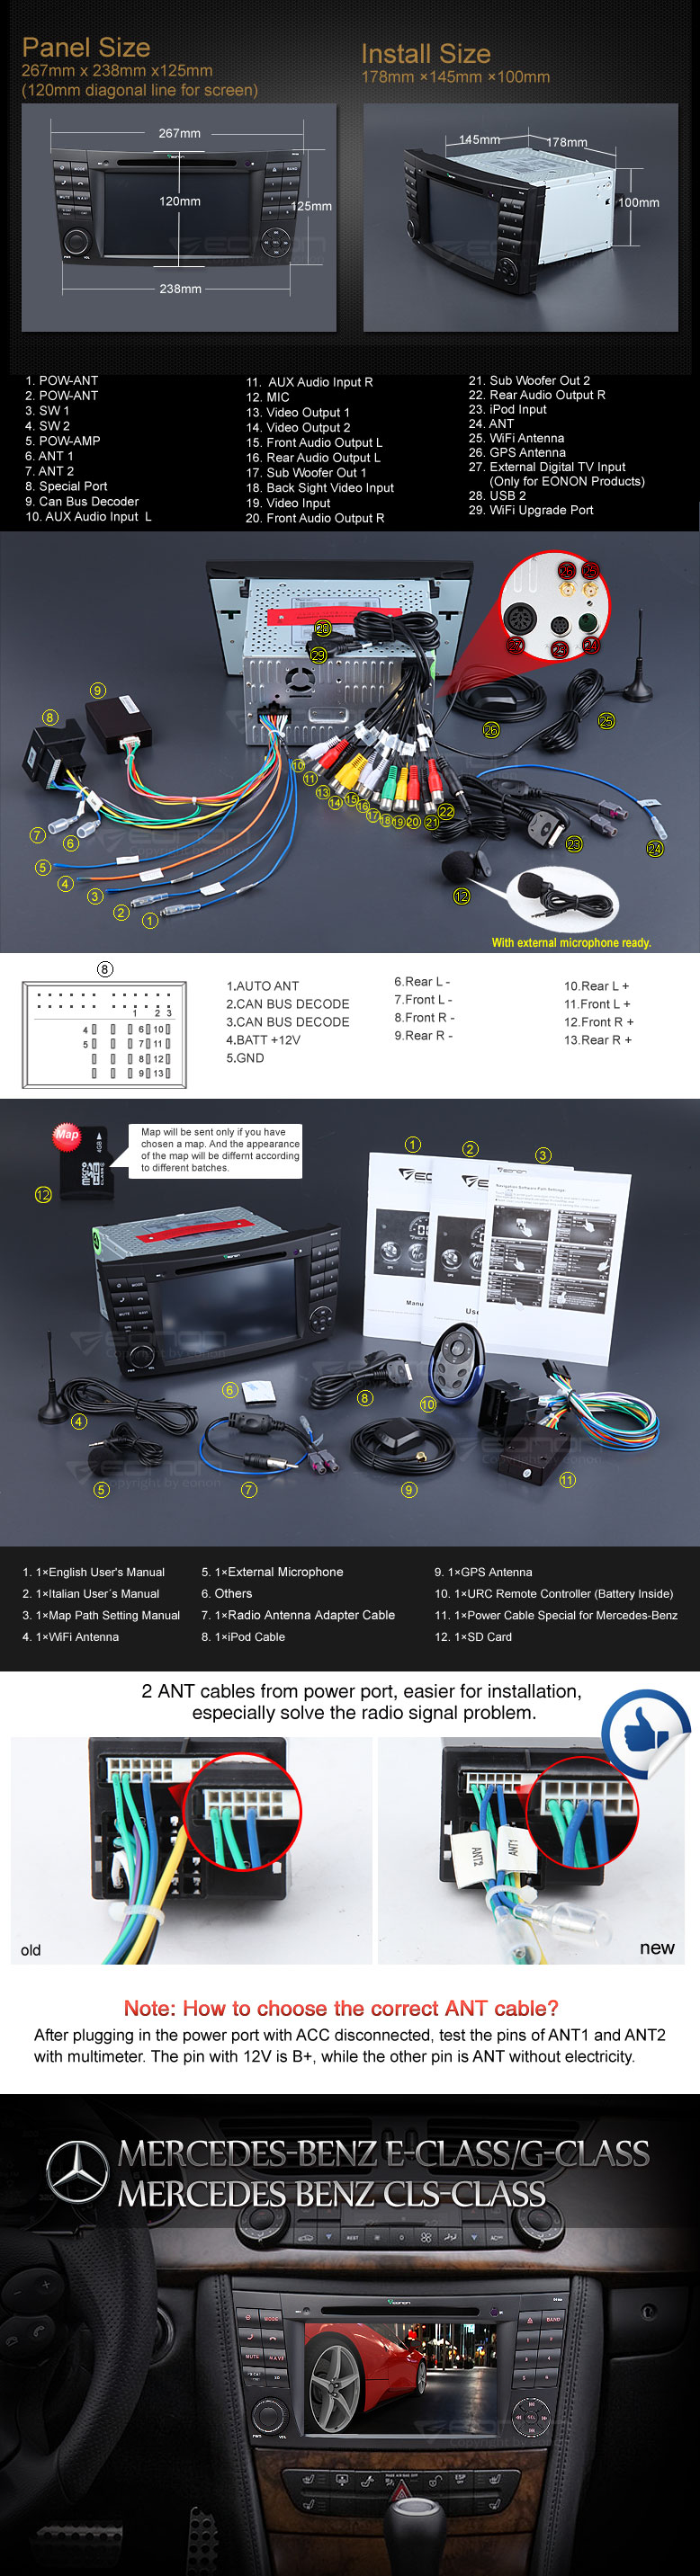 MERCEDES BENZ W211 E-Class C219 CLS-Class 7″ DIGITAL TOUCH SCREEN ANDROID  IOS MULTIMEDIA CAR DVD GPS